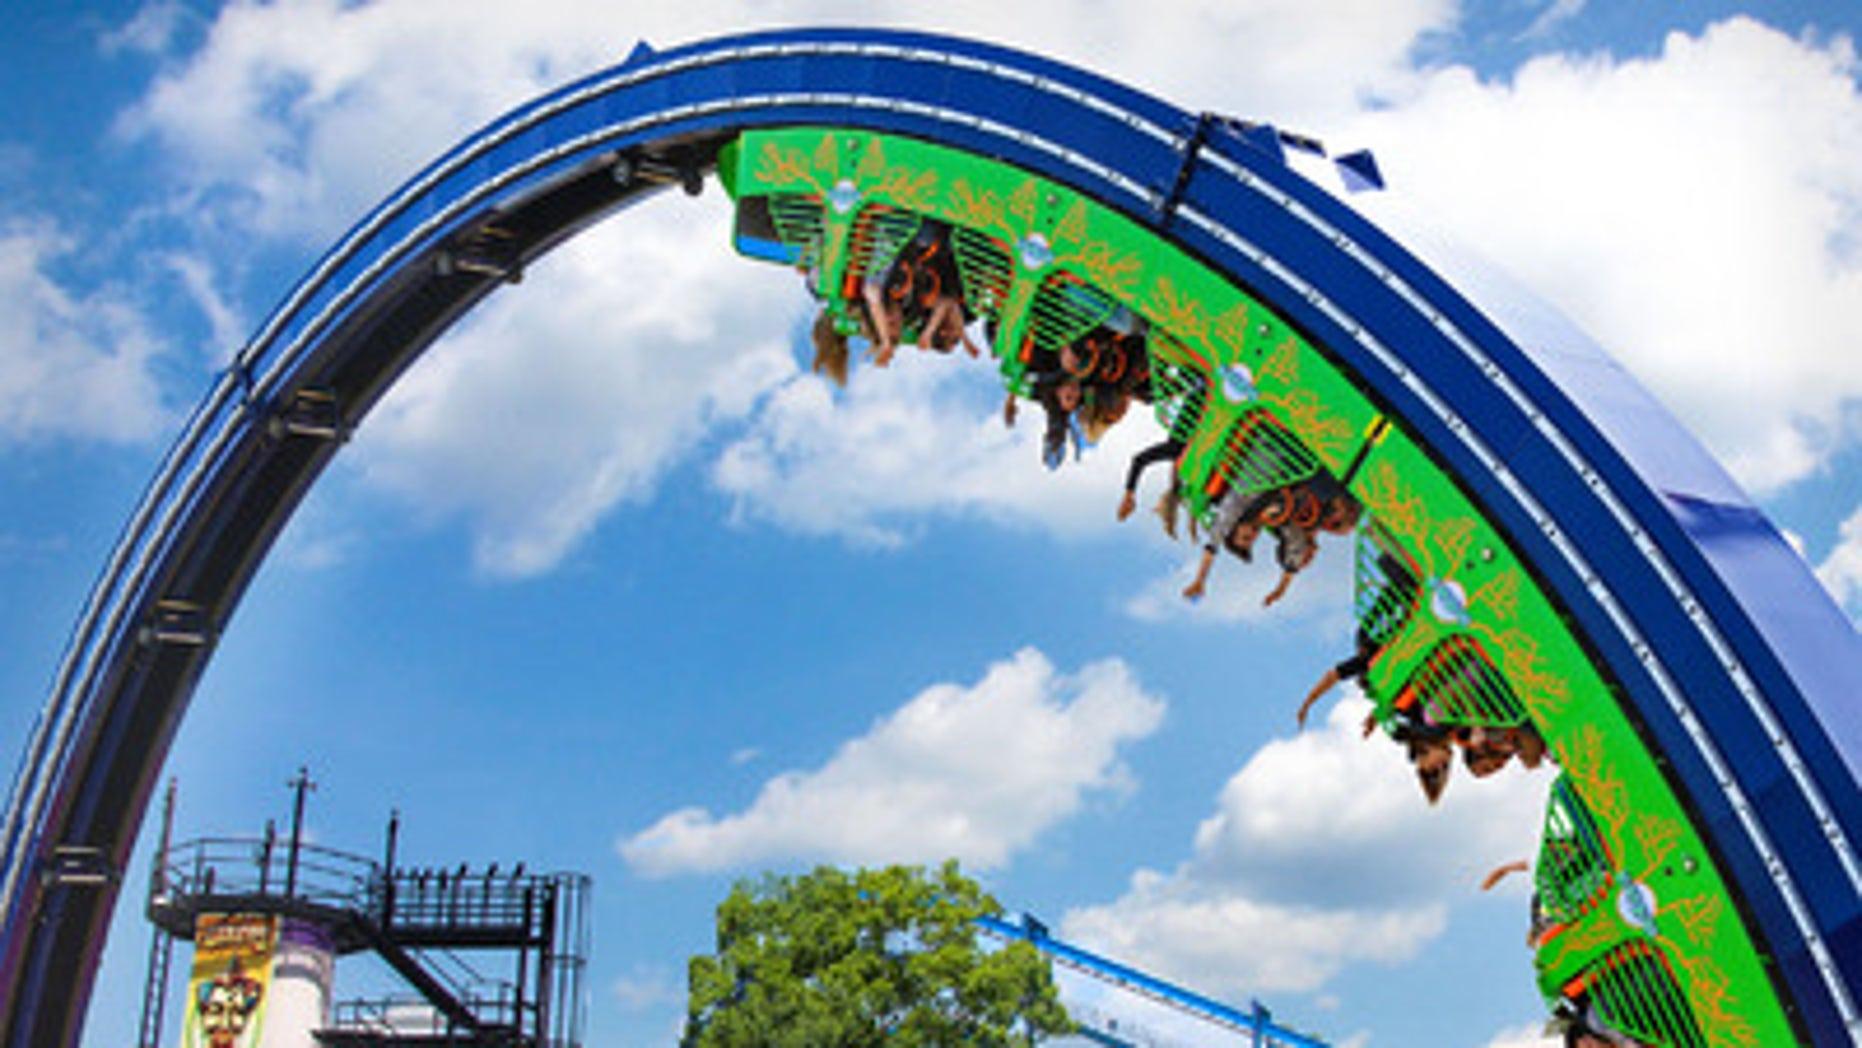 The Joker Chaos coaster, Six Flags Over Georgia.